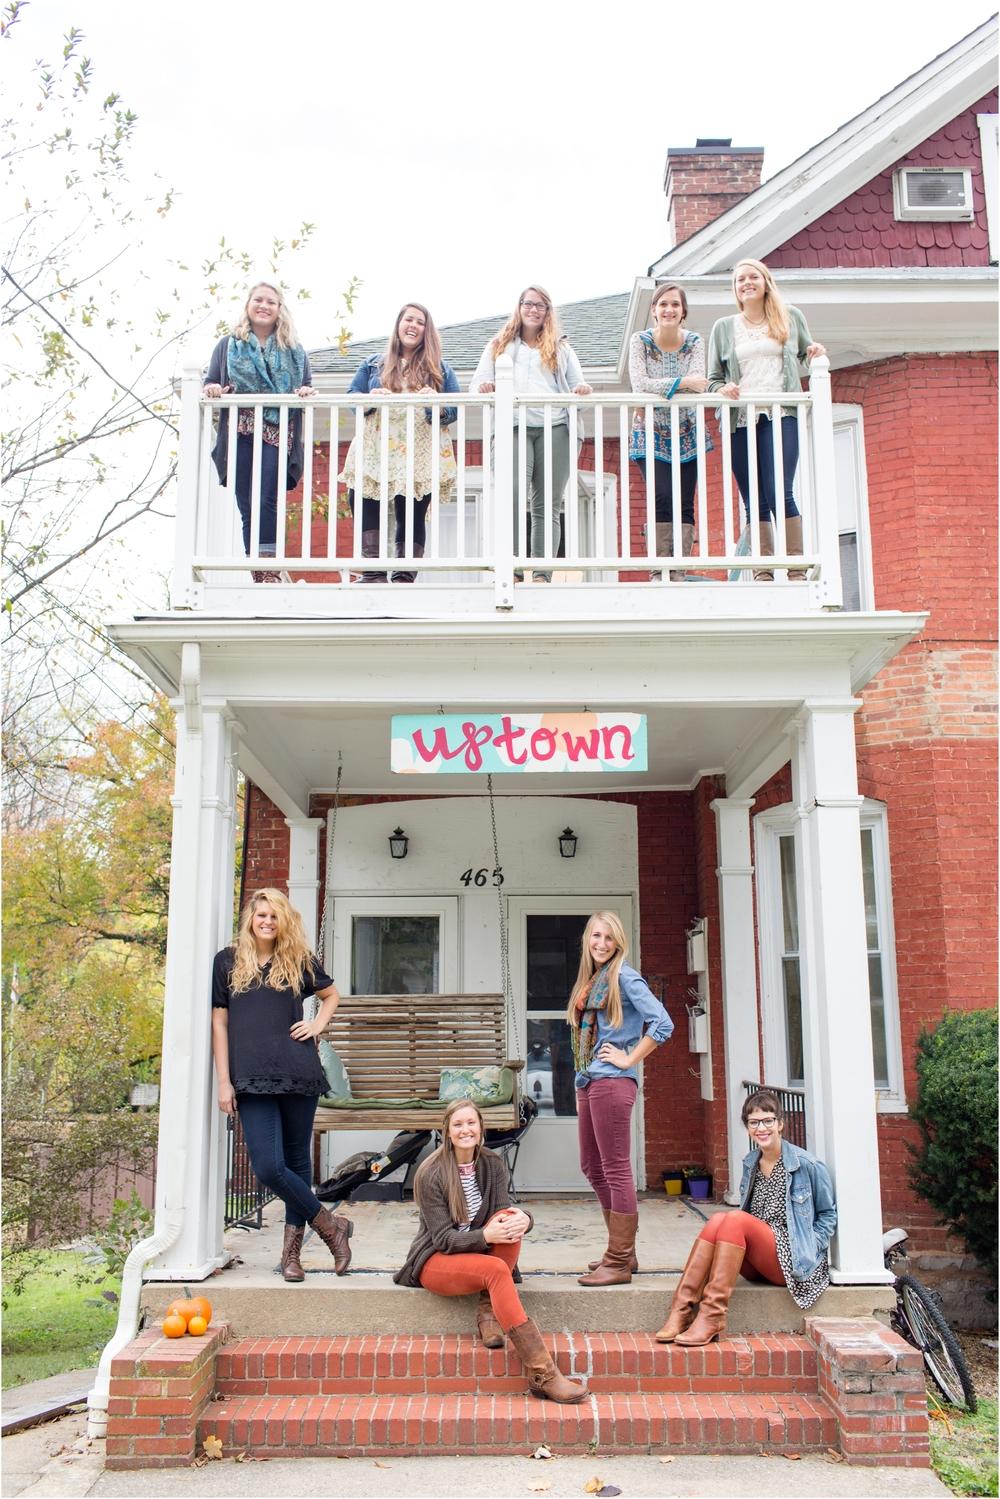 Uptown-2014-2.jpg